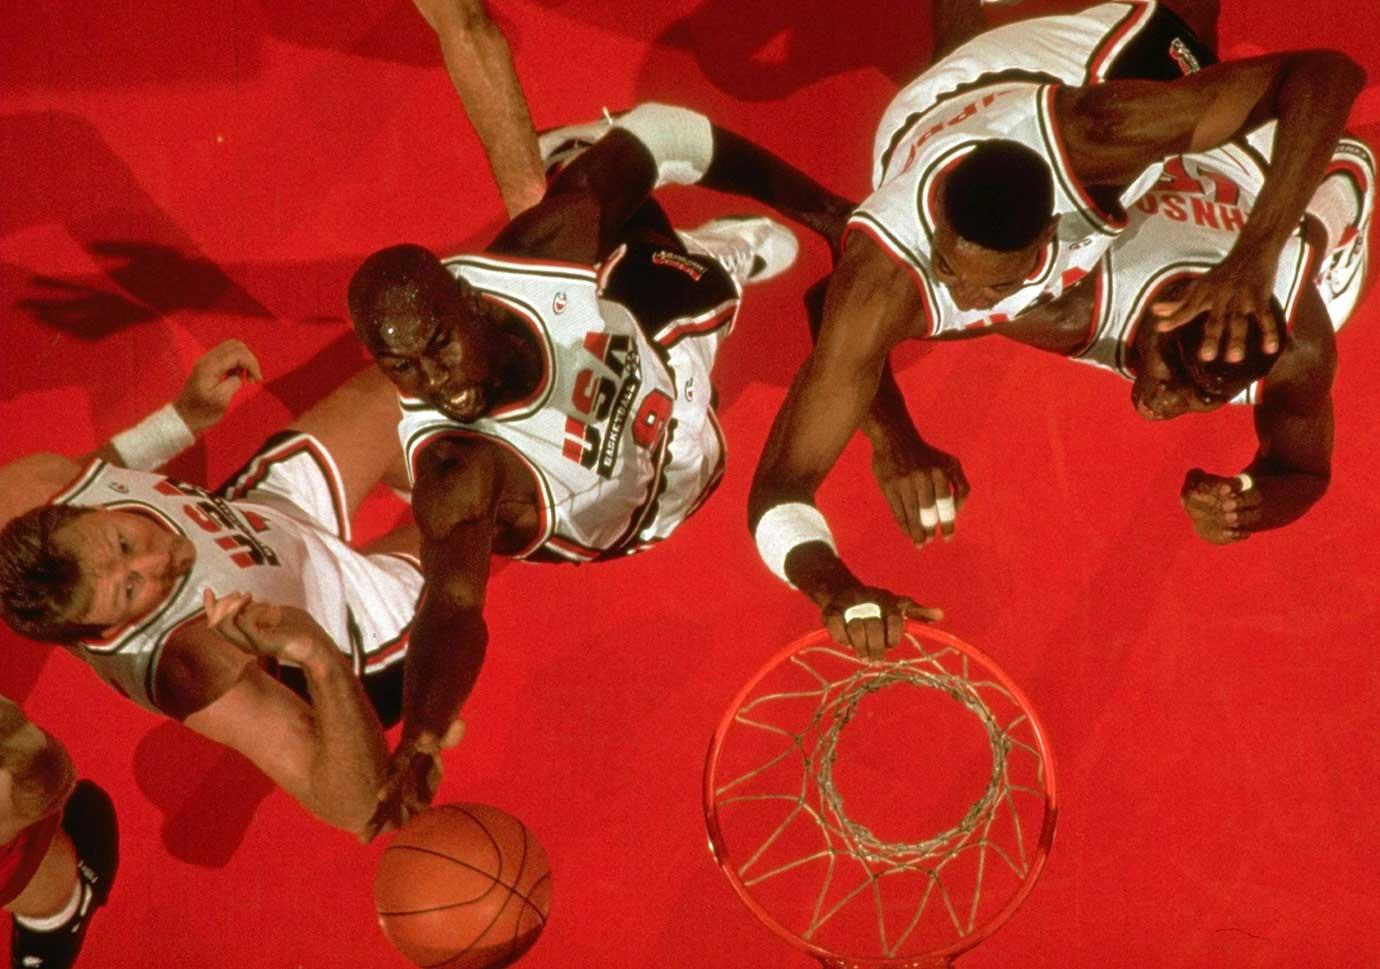 The Dream Team's Larry Bird, Michael Jordan, Scottie Pippen and Magic Johnson during the final against Croatia in 1992.